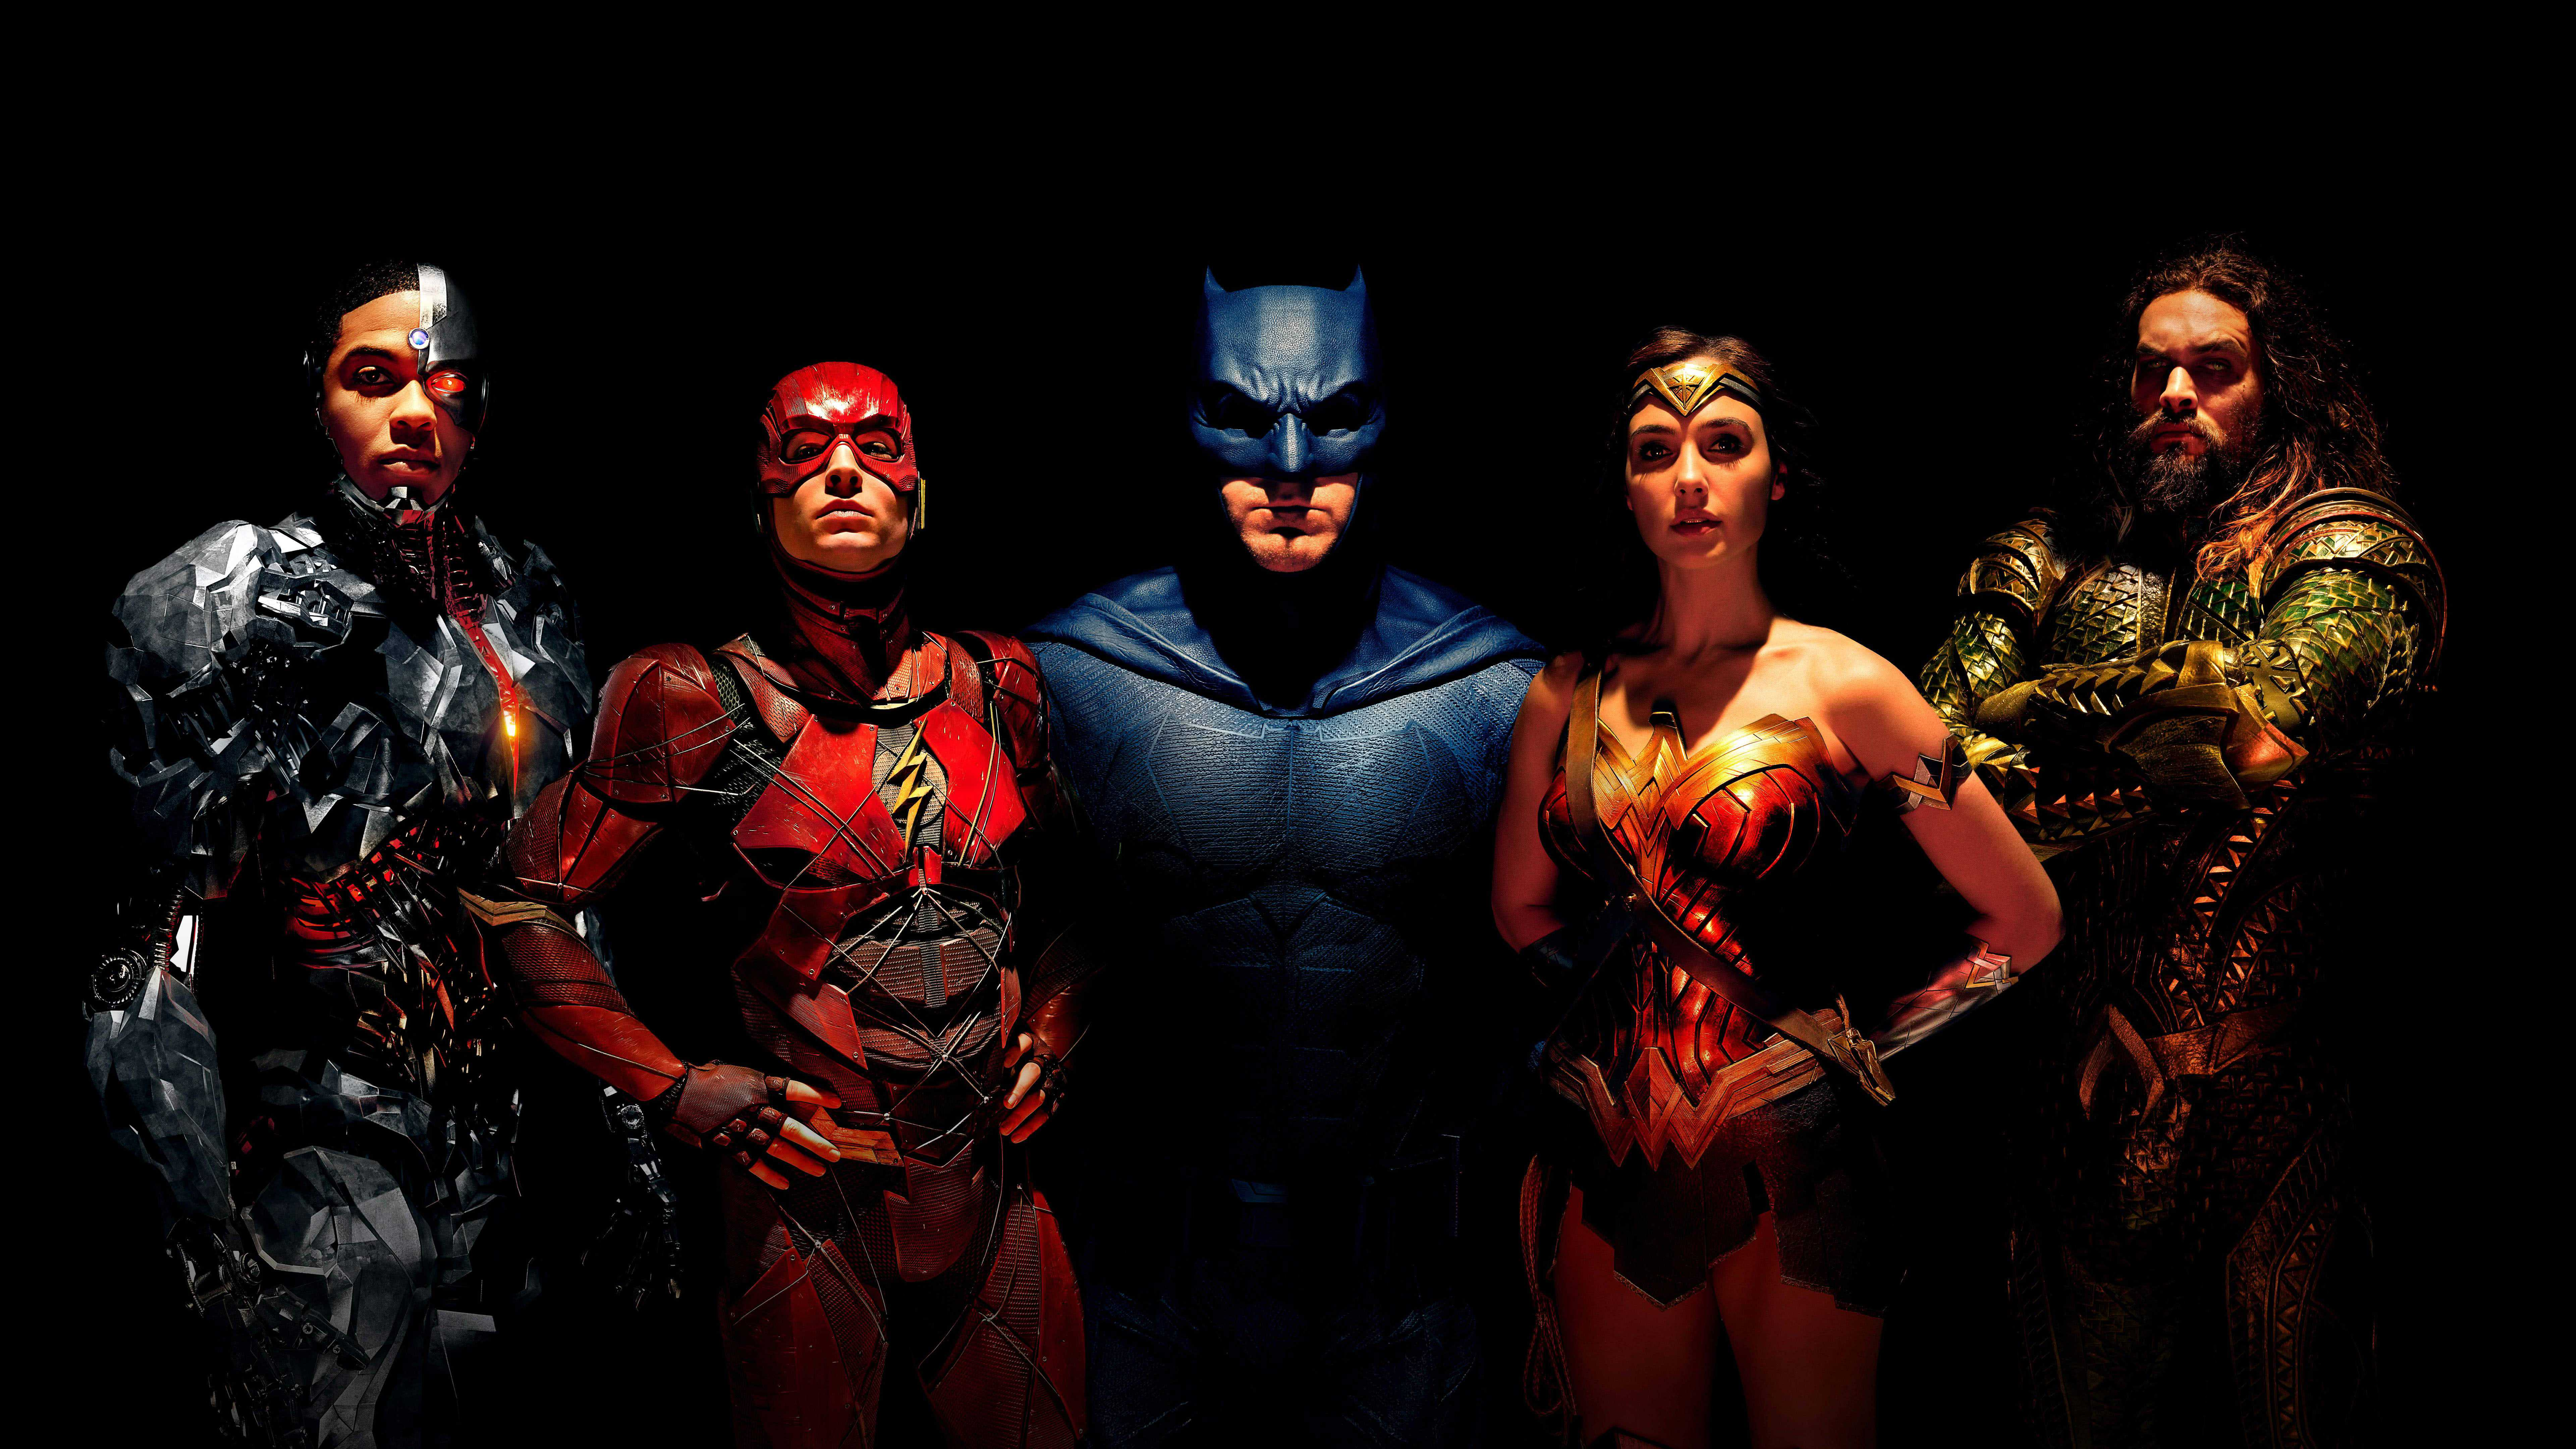 justice league uhd 8k wallpaper